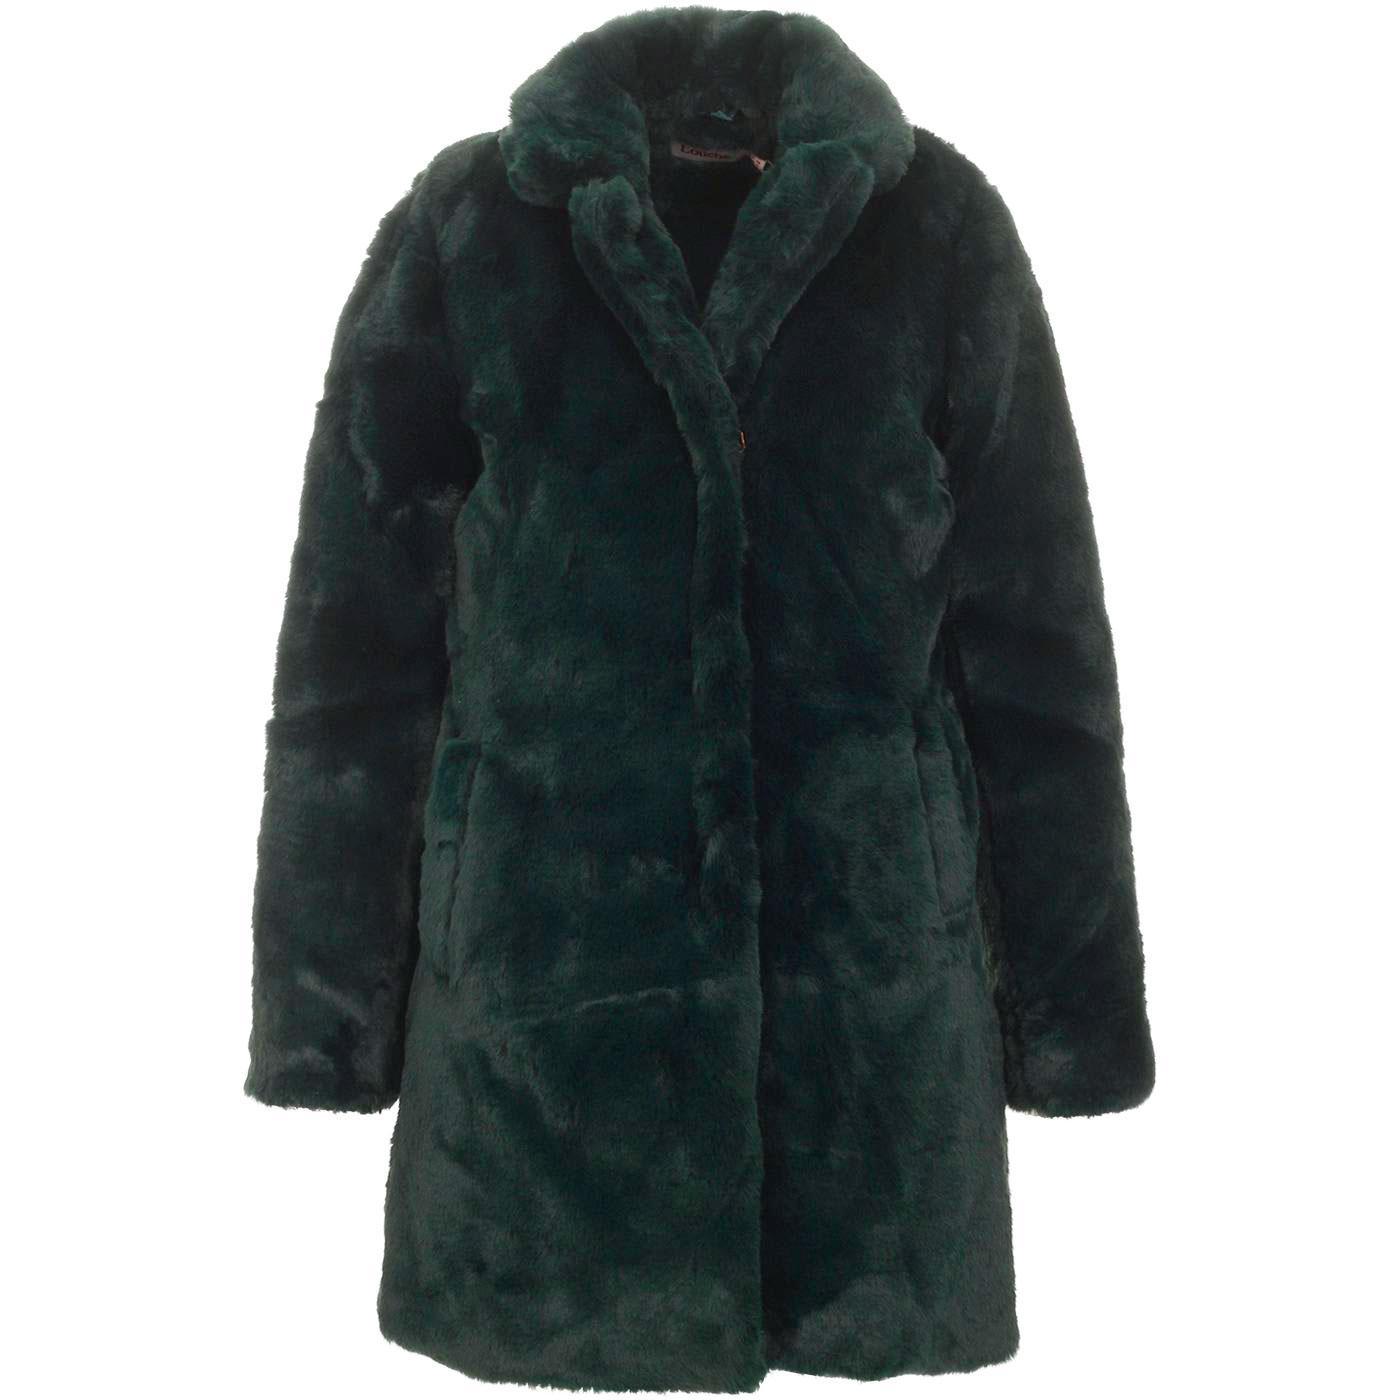 Wainwright LOUCHE Vintage Faux Fur Coat In Green